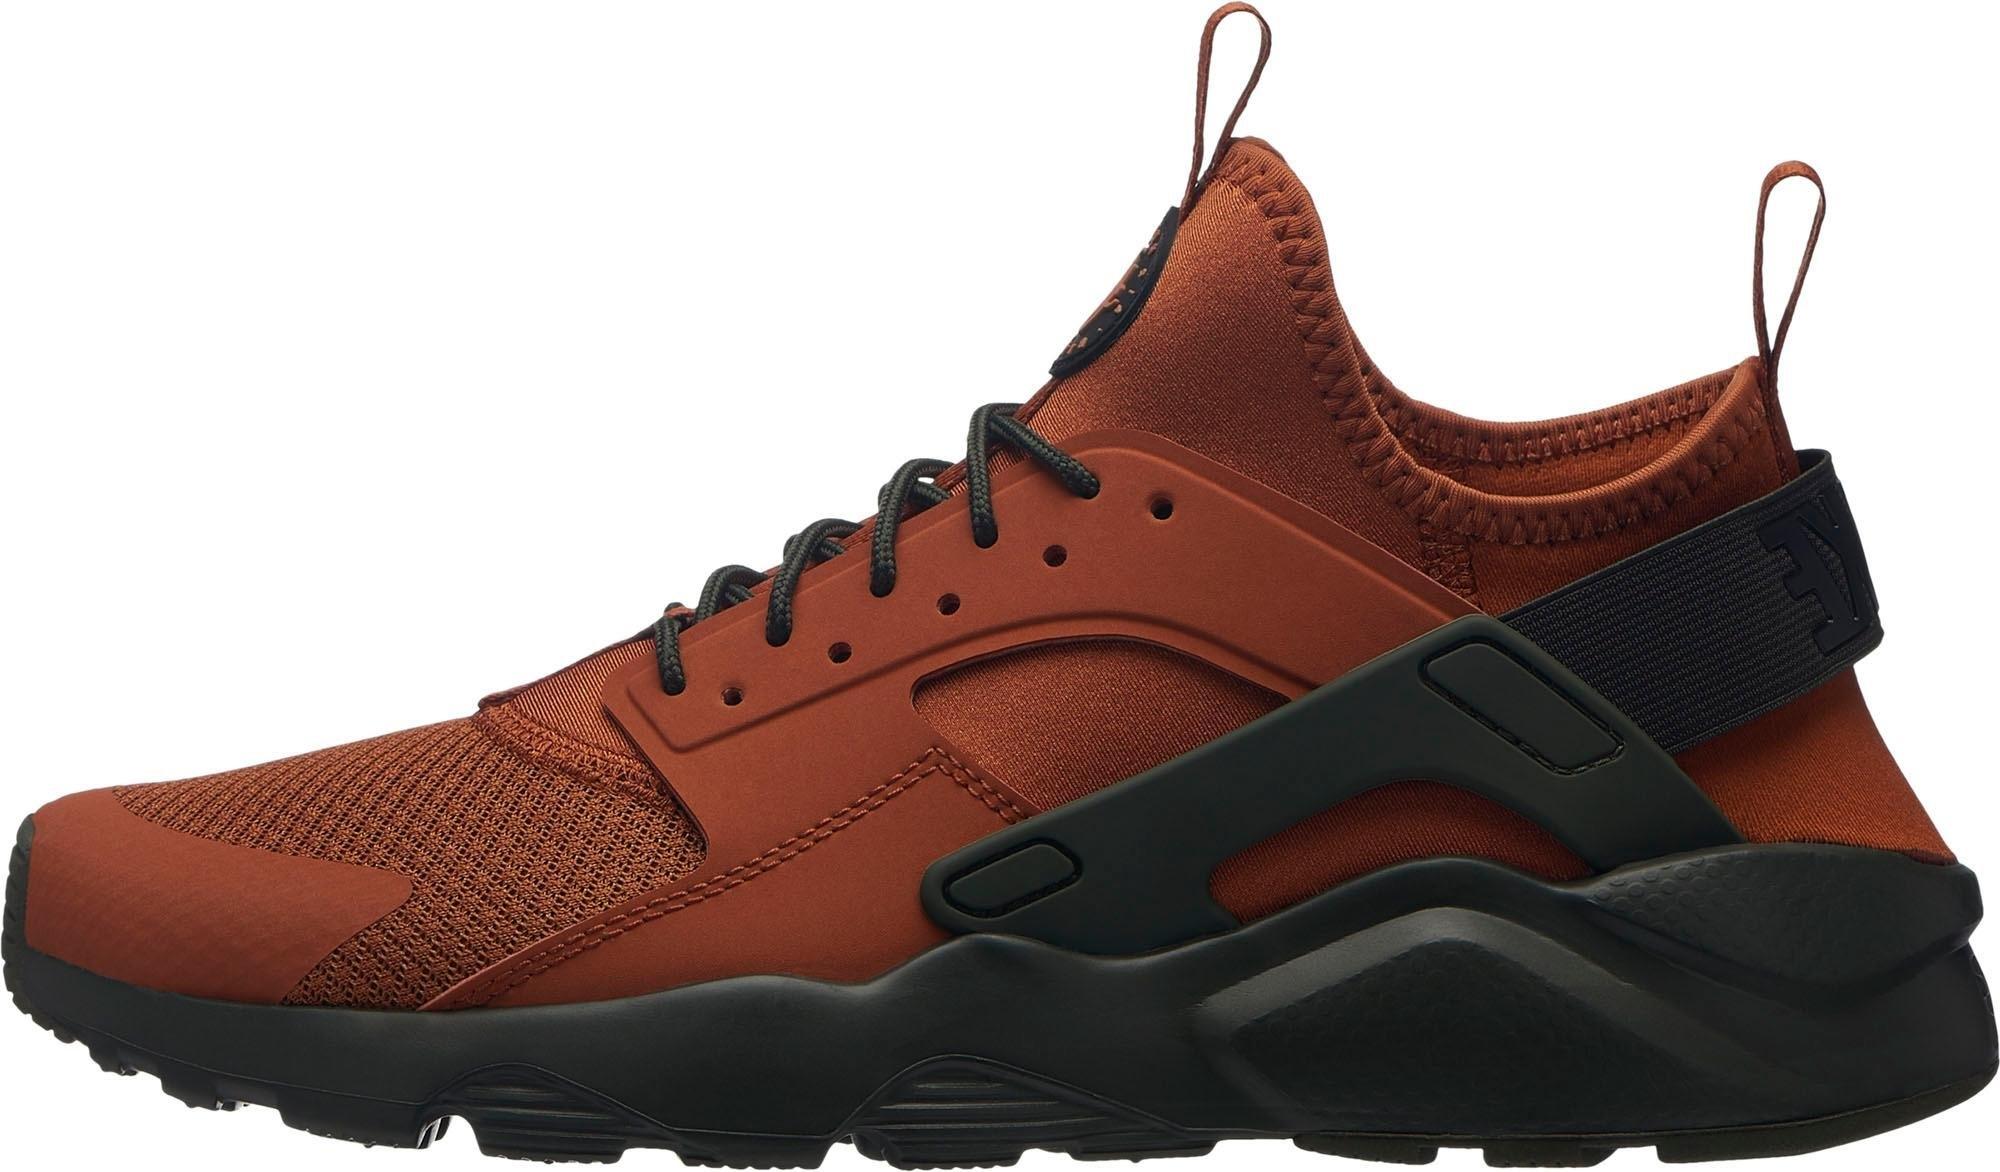 huge selection of 07c6f 32a05 Afbeeldingsbron Nike Sportswear sneakers »Air Huarache Run Ultra«